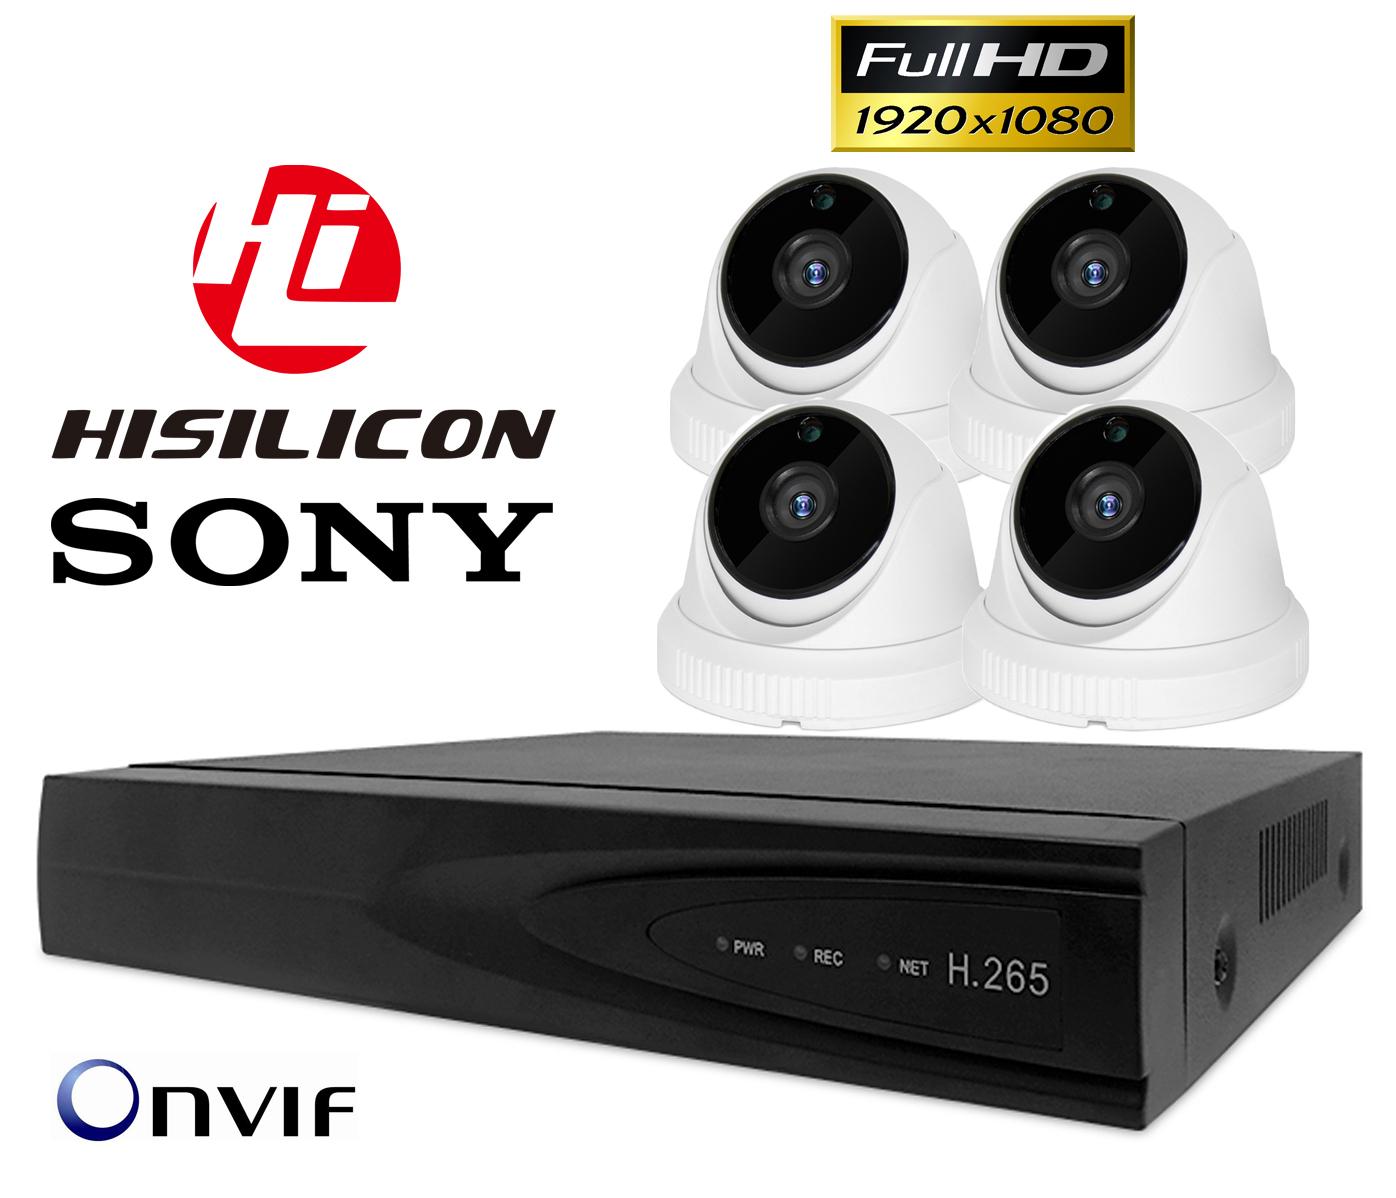 4x FULL HD SONY MONITORING H265+ NVR POE WDR IR Kod producenta TS08 + 4x wew. CP200